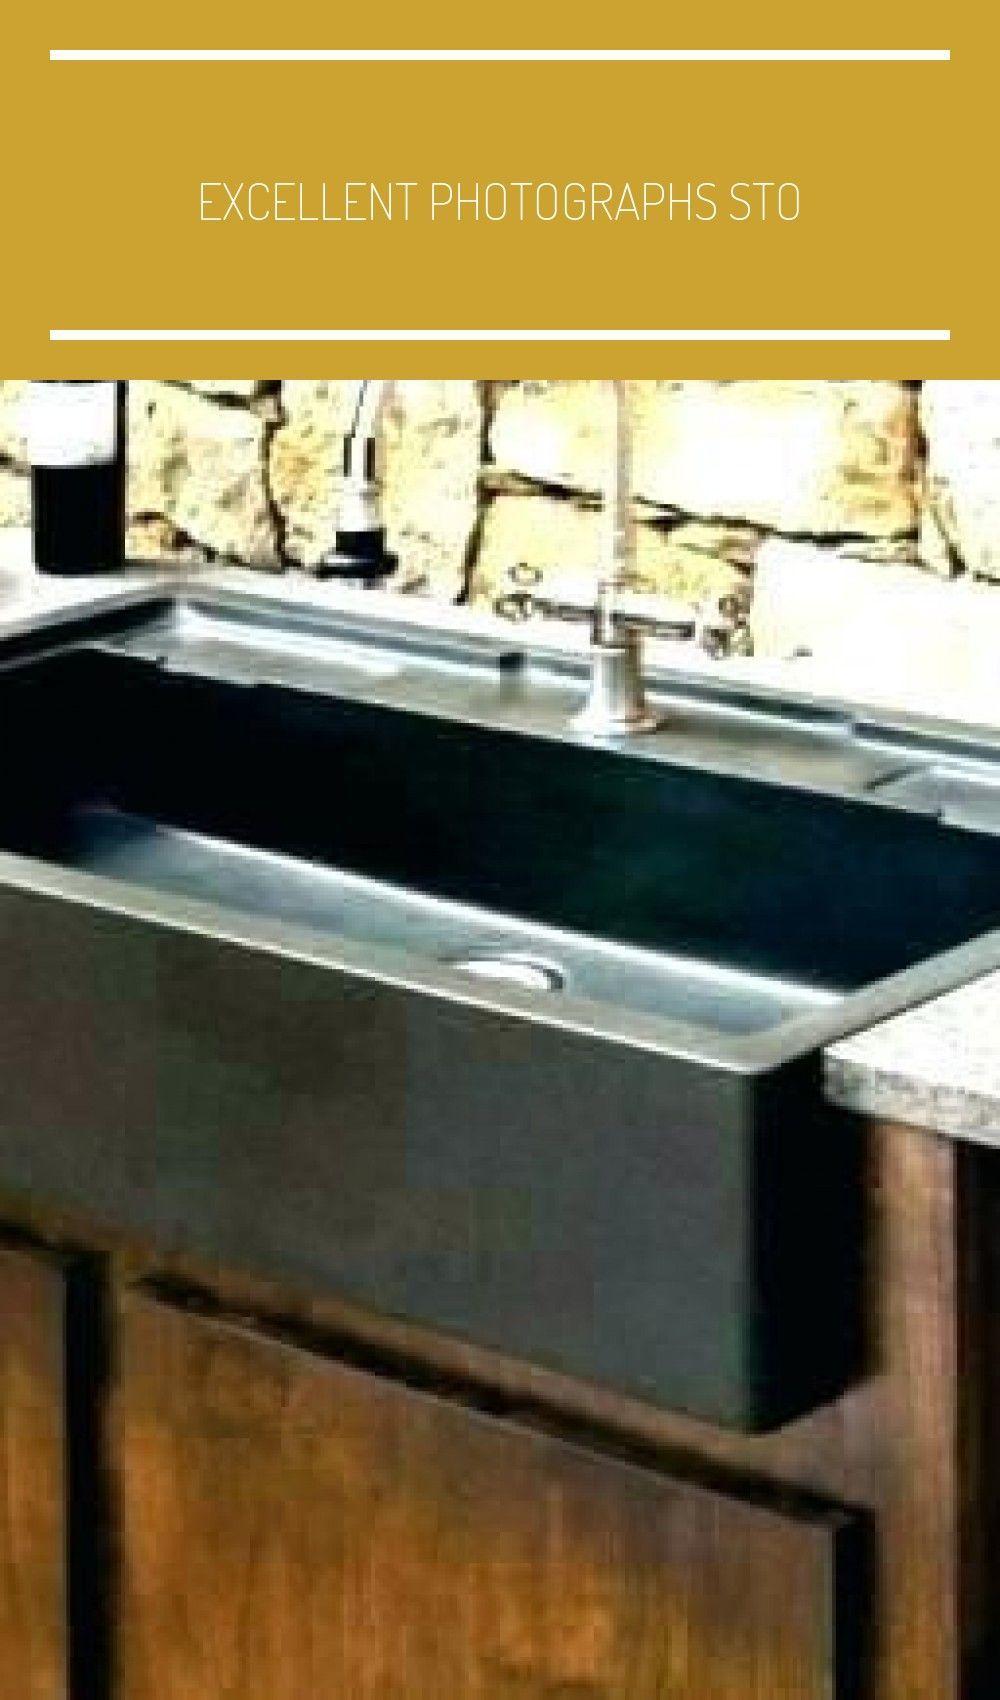 Excellent Photographs Stone Farmhouse Sink Strategies Being From Ireland And Hav In 2020 Diy Dekoration Dekoration